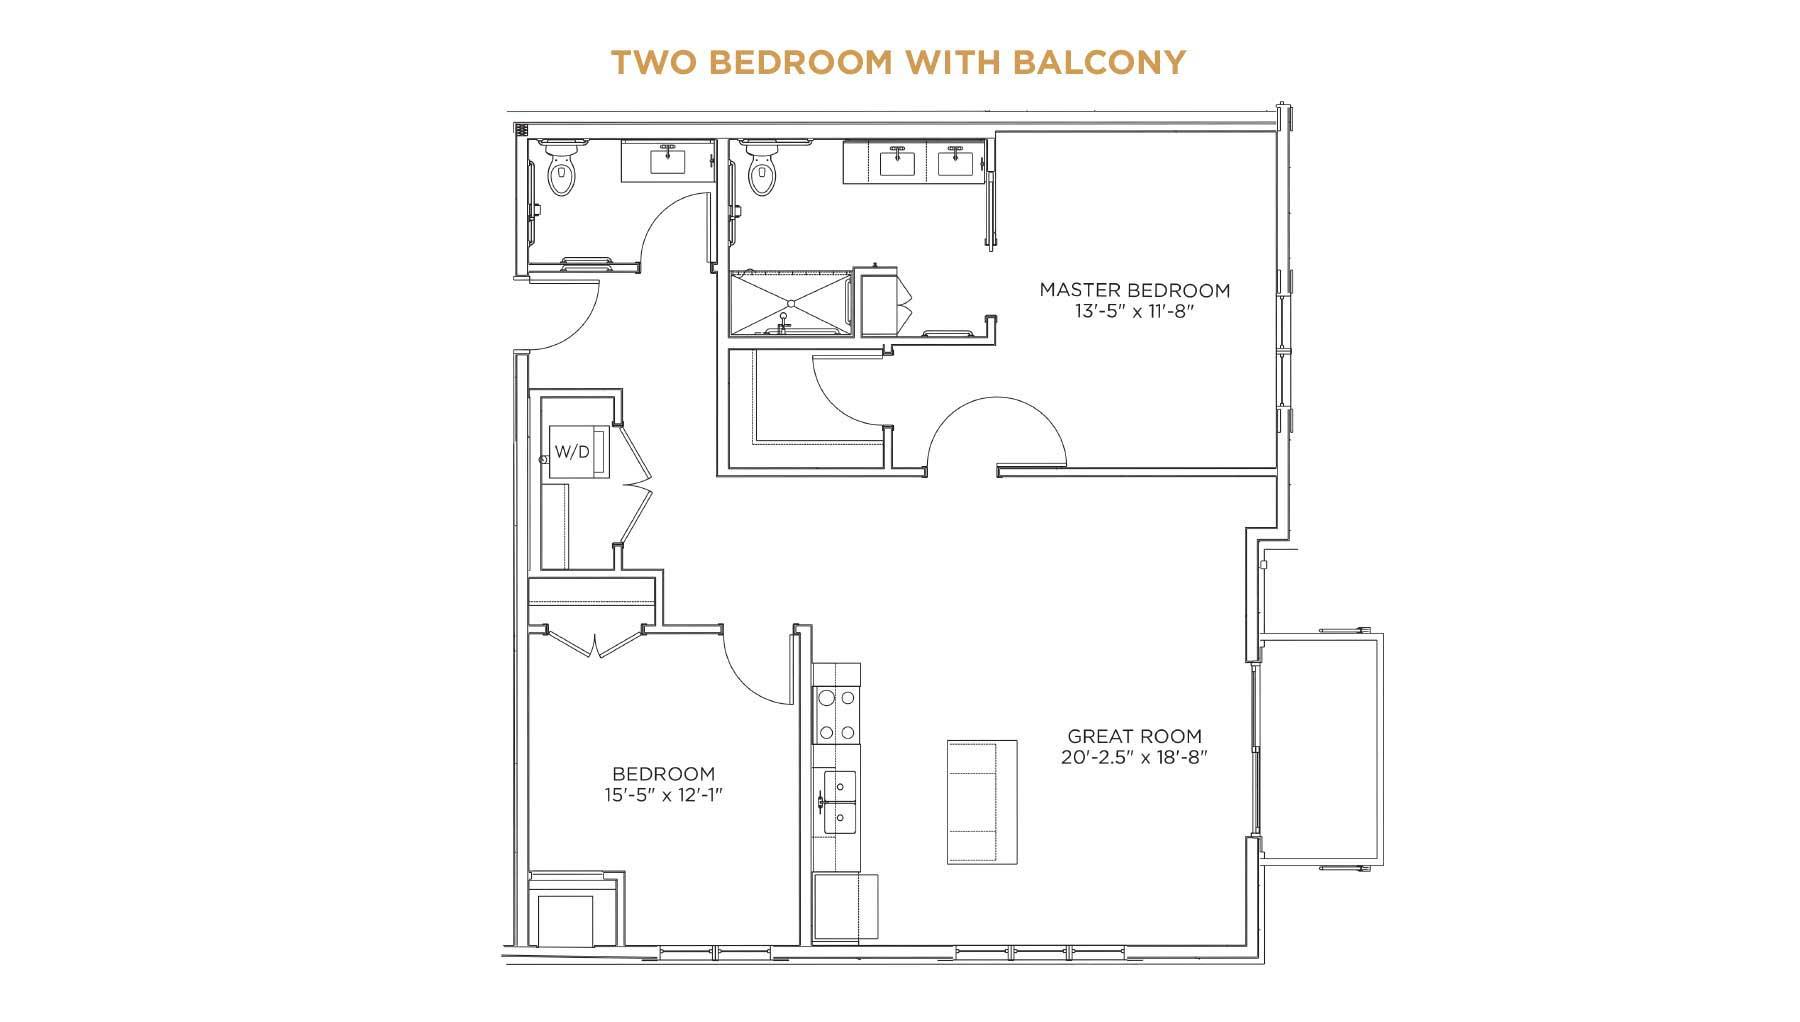 two bedroom floorplan with balcony